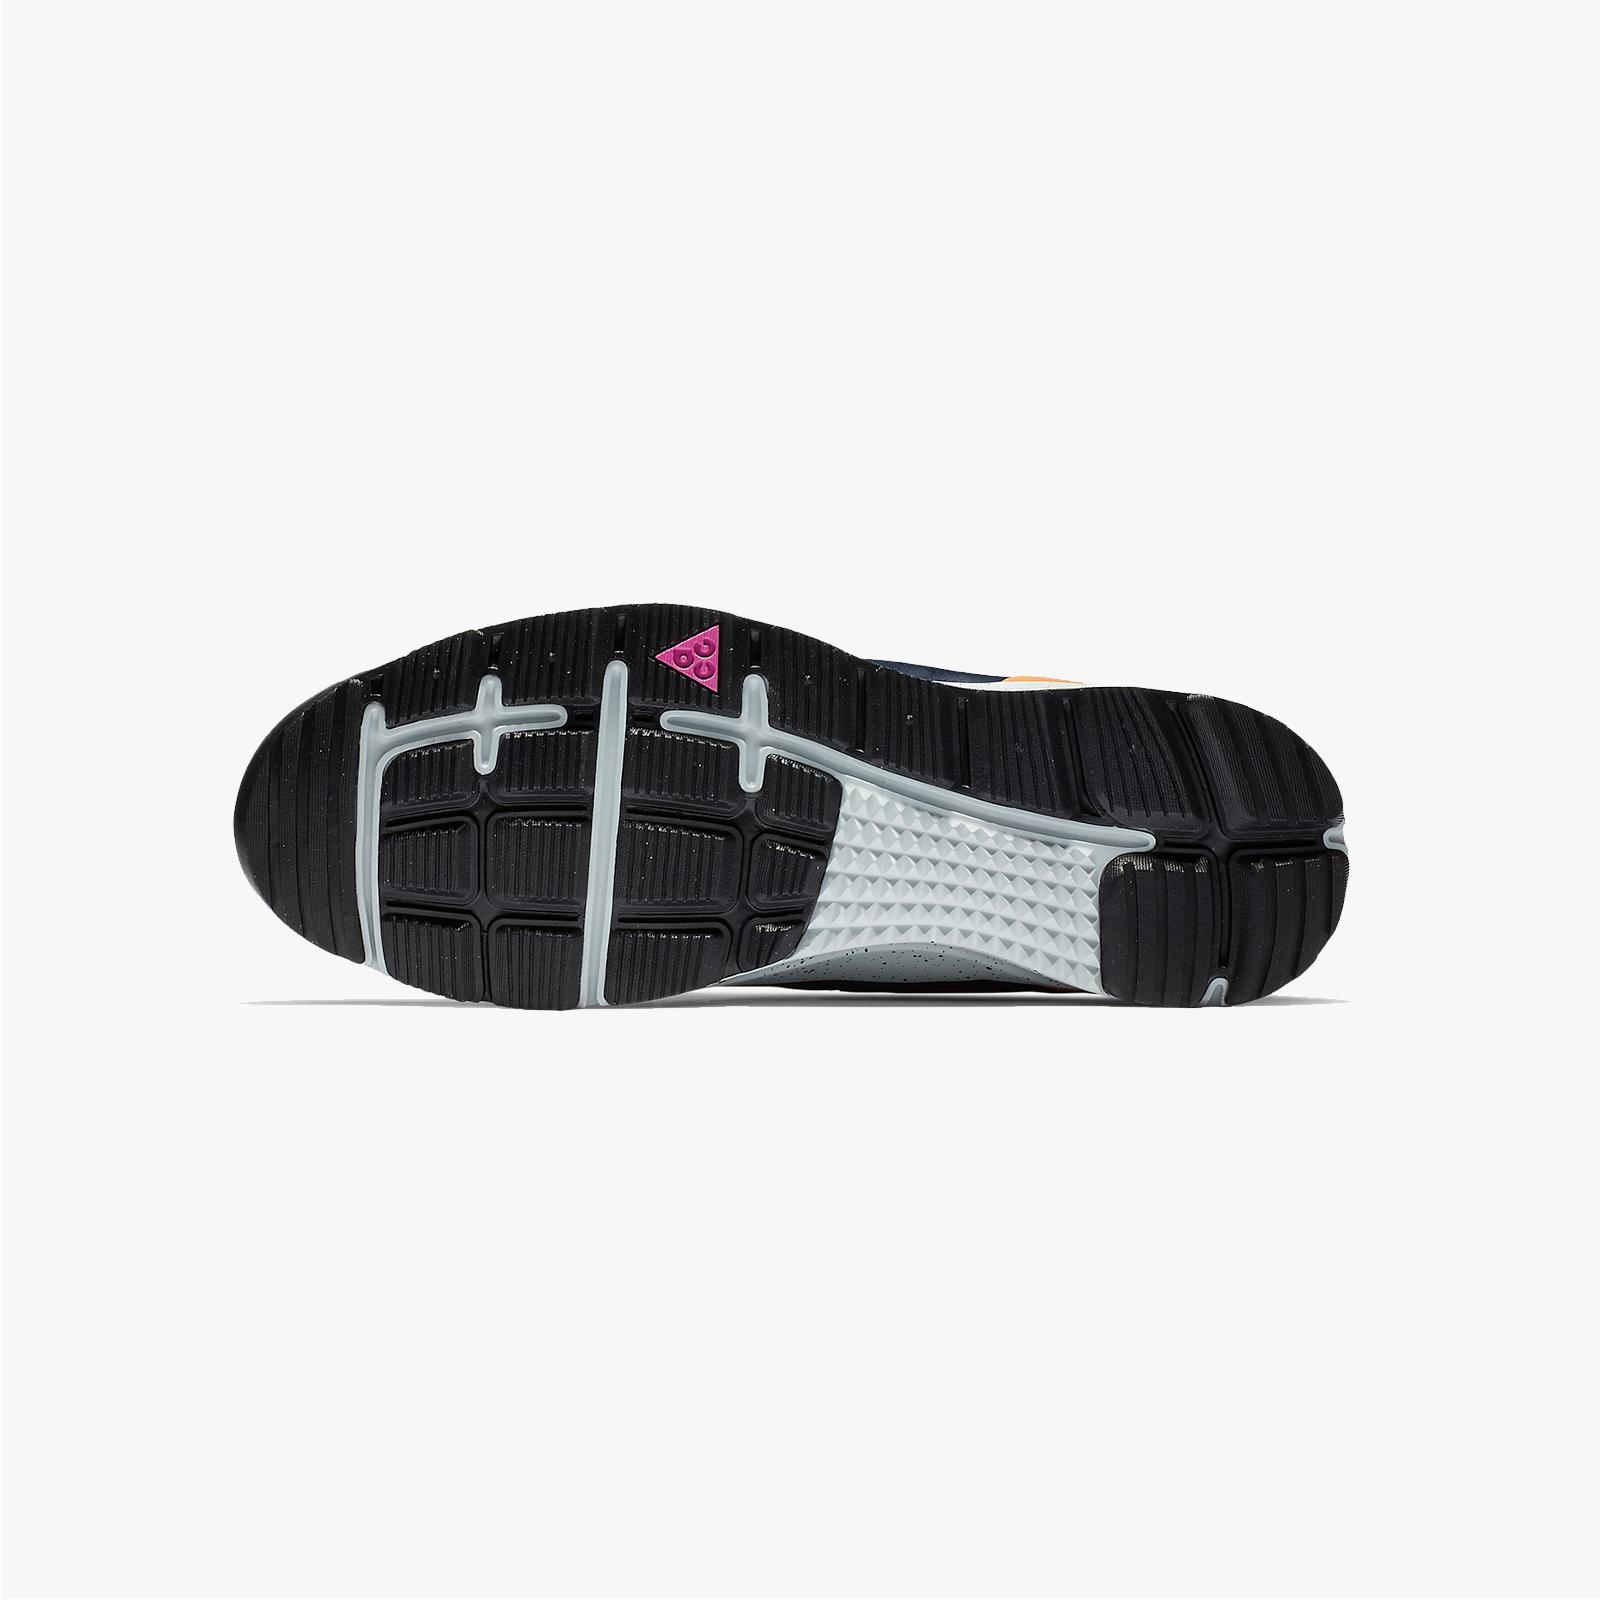 designer fashion 8e77c 301d6 Nike ACG Okwahn II - 7. Close